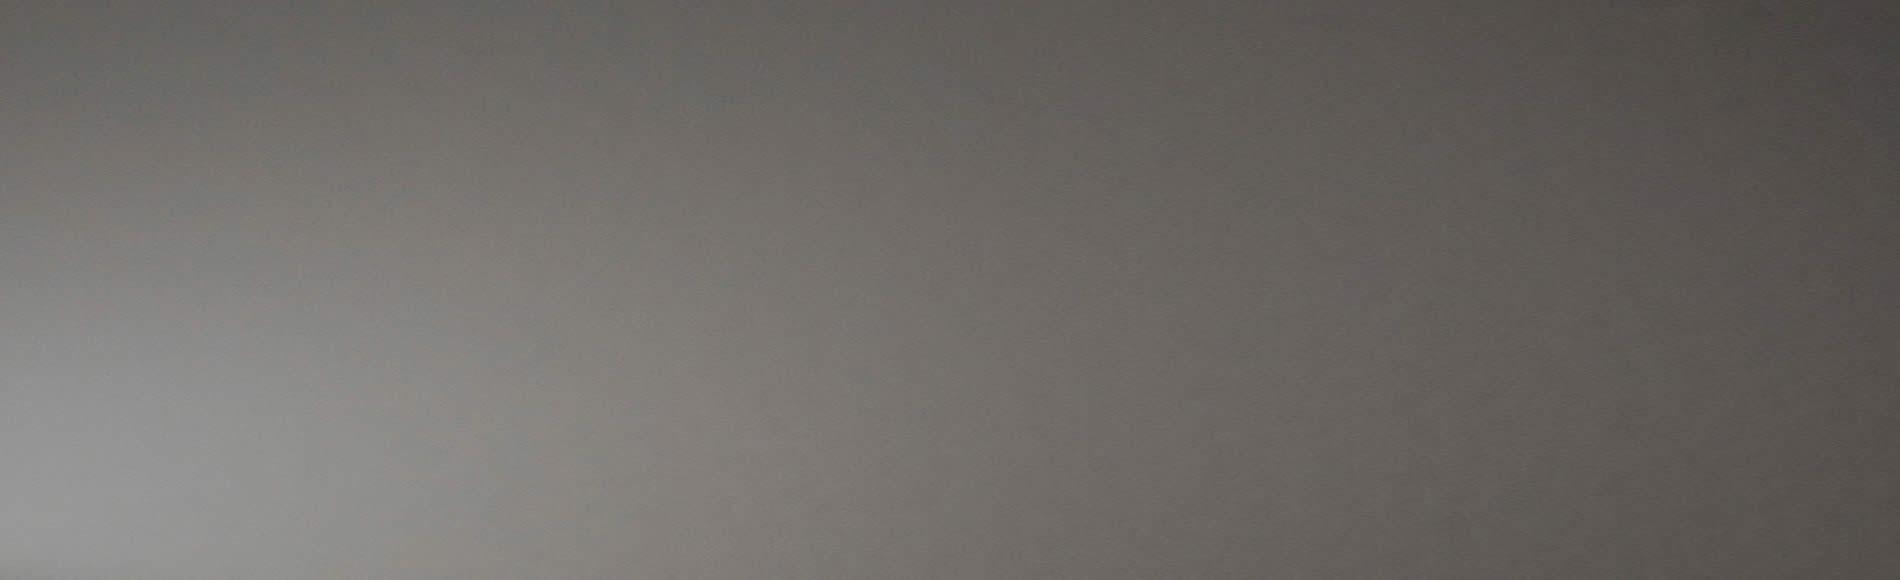 grey-background